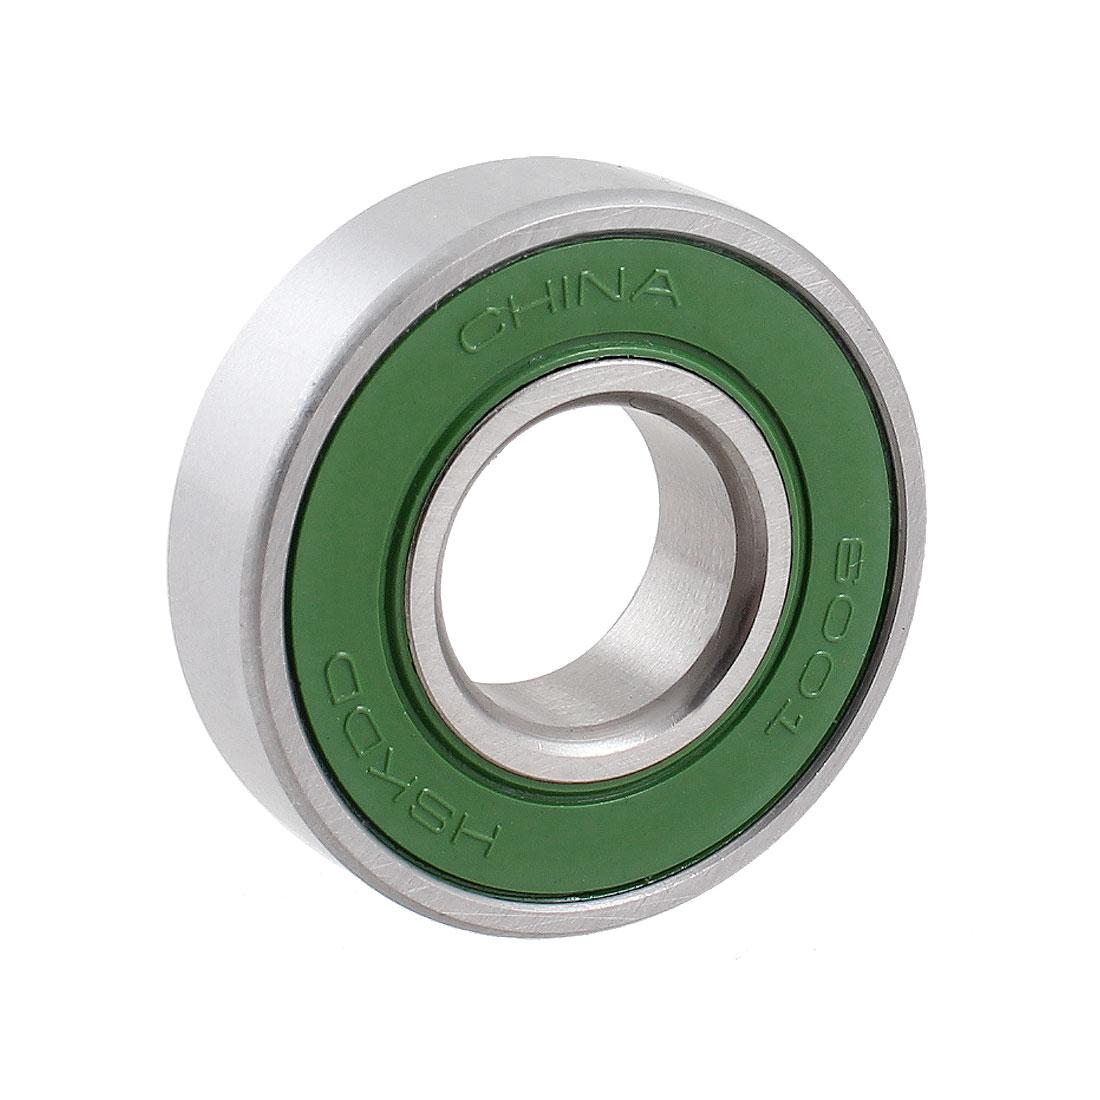 12mm x 28mm x 8mm Ball Wheel Bearings Silver Tone Green 6001